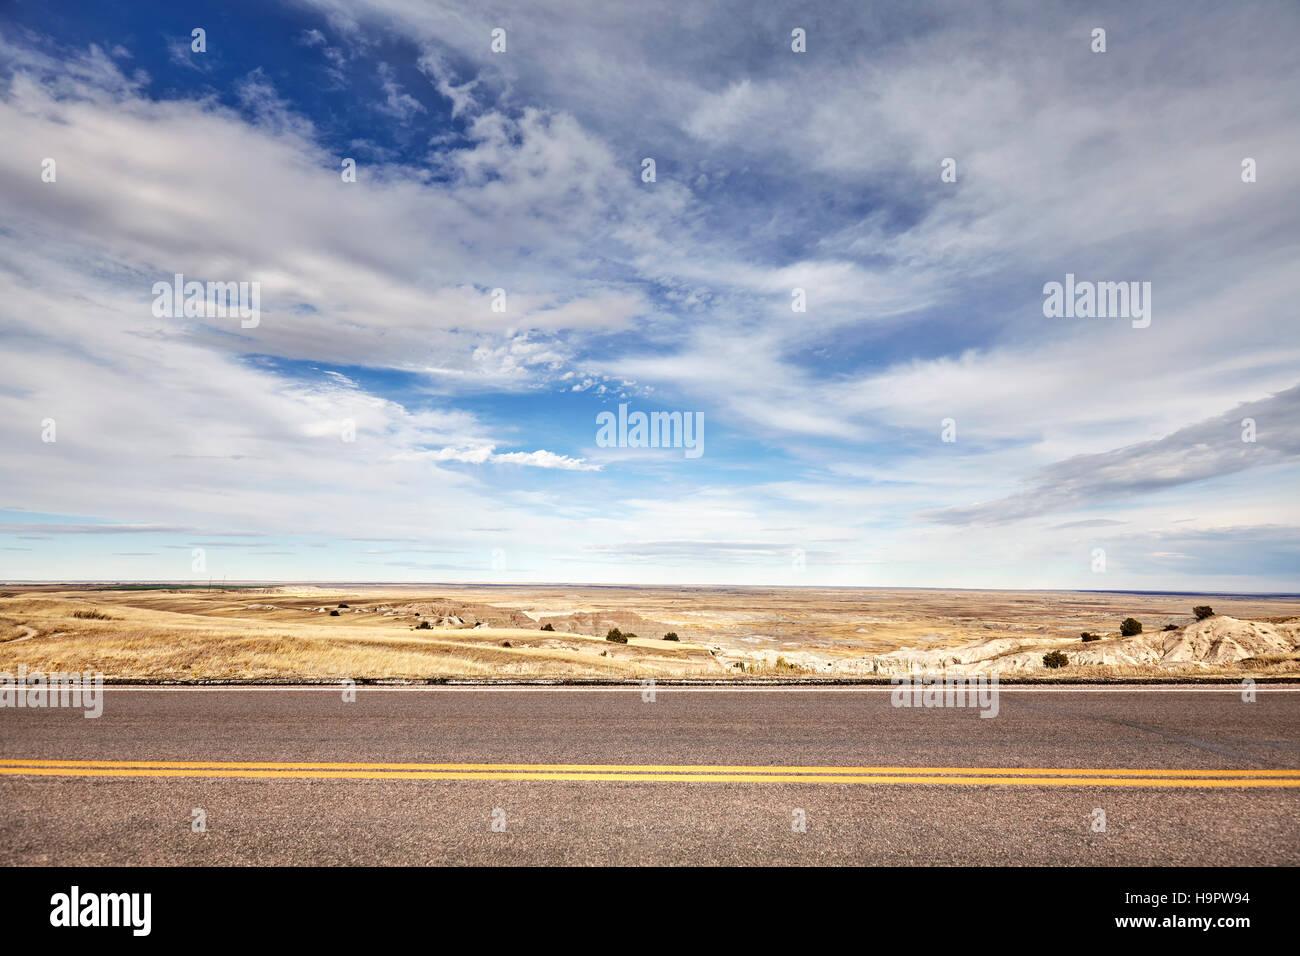 Desert road, travel concept background, USA. - Stock Image